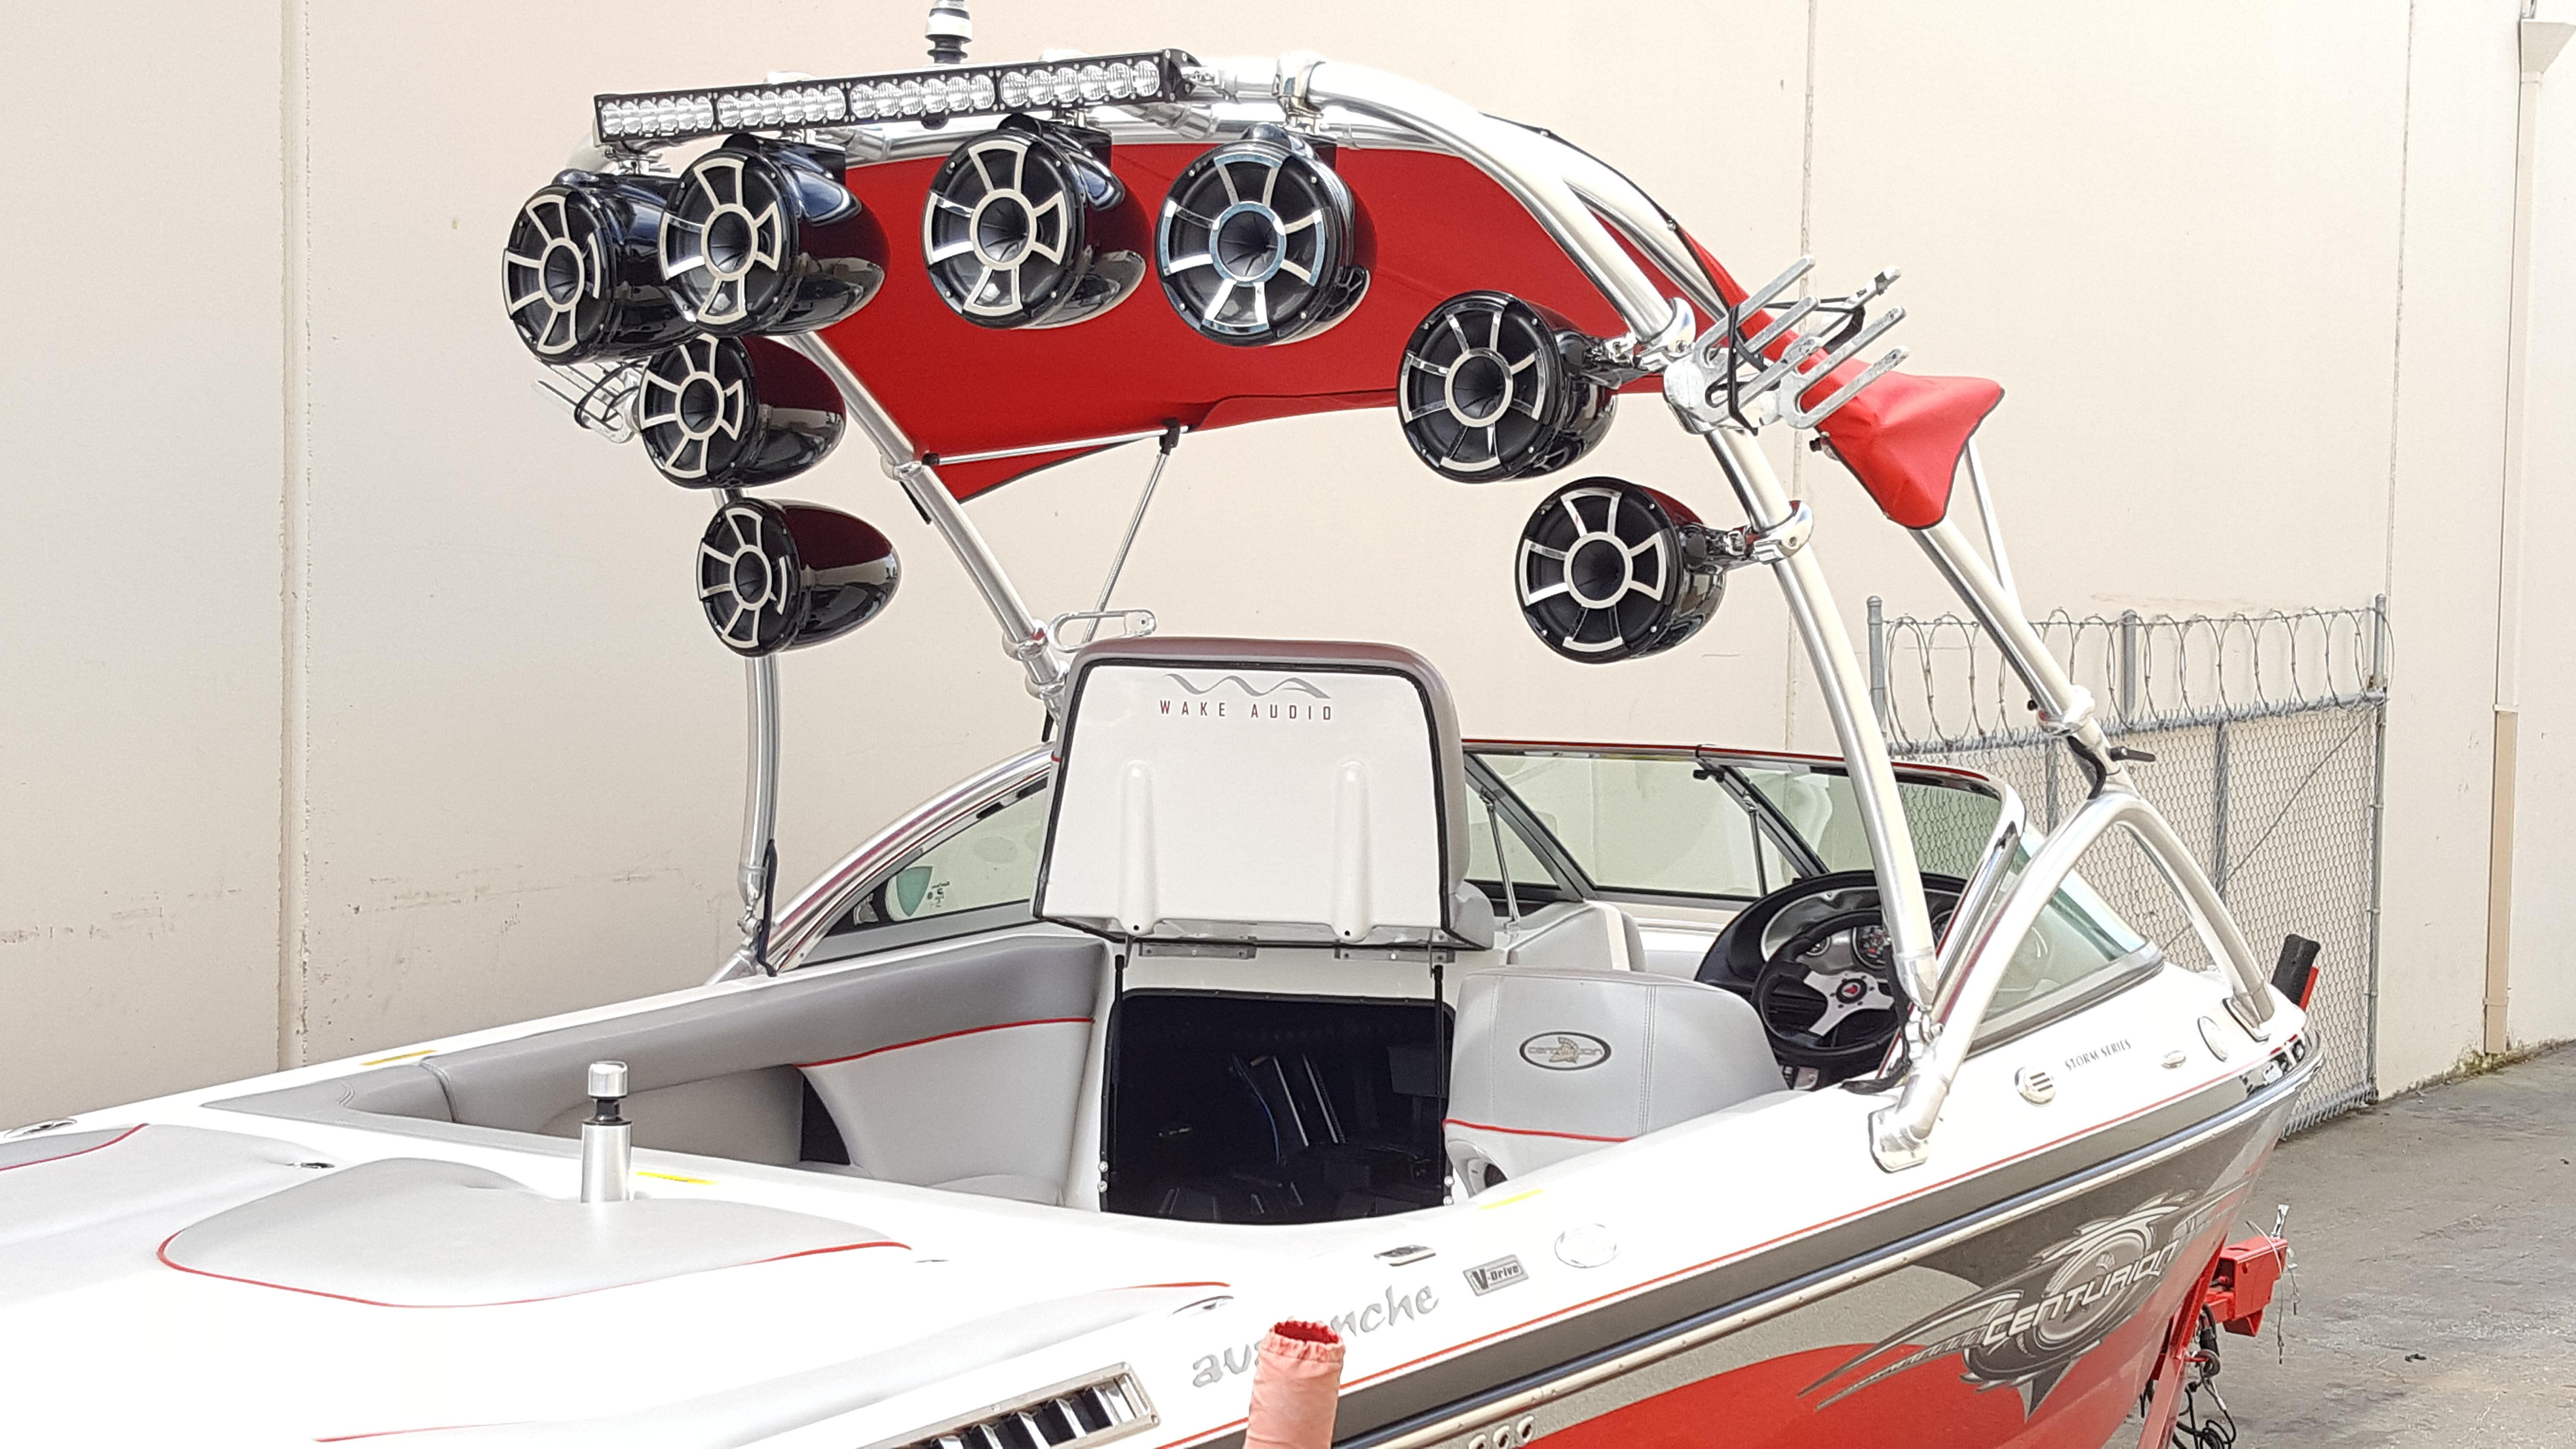 2008 Centurion Avalanche (6)